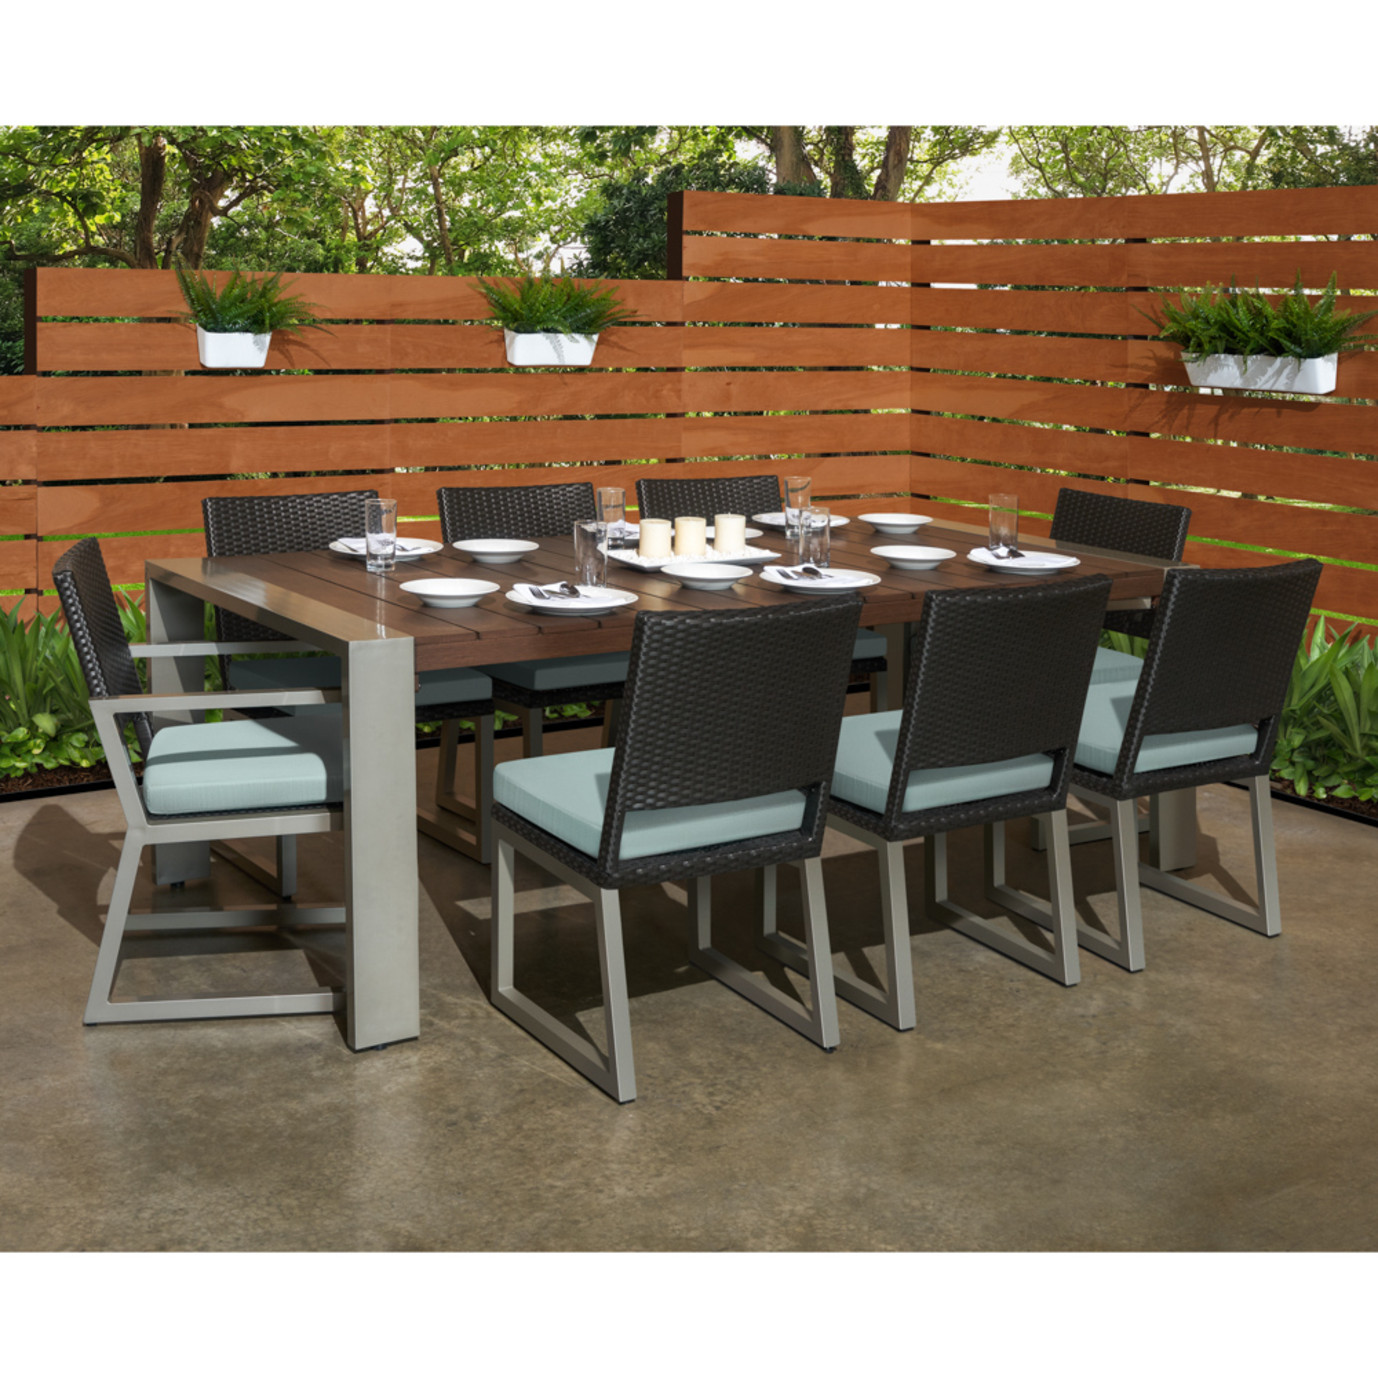 Milo™ Espresso 9pc Dining Set - Spa Blue